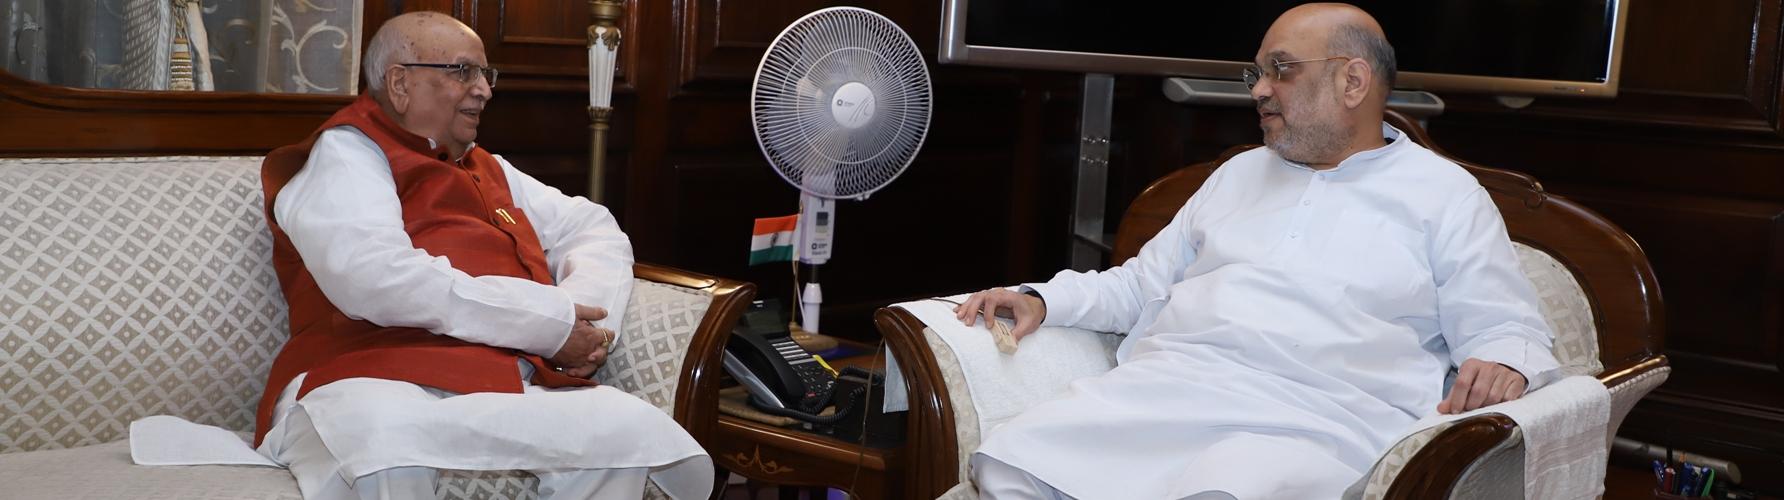 The Governor  of Madhya Pradesh Shri  Lalji Tandon  calling on the Union Home Minister, Shri Amit Shah in New Delhi on August 27, 2019.